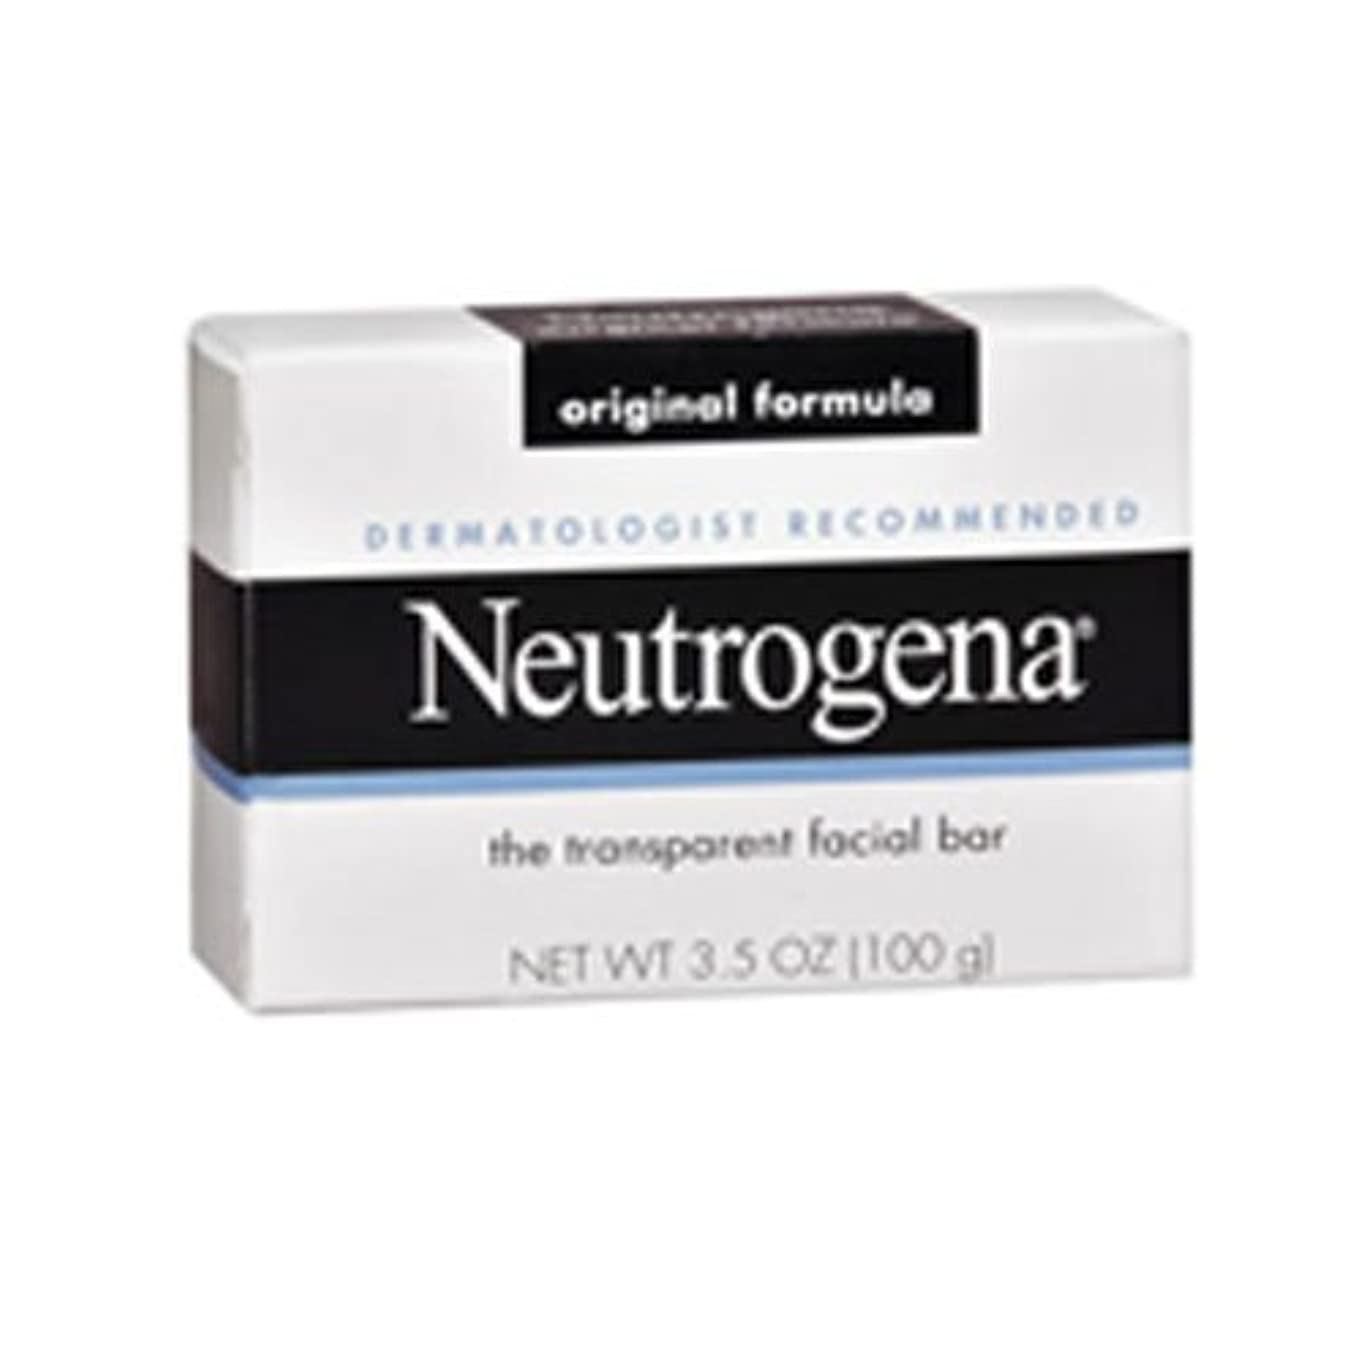 洗剤弱点奇跡海外直送肘 Neutrogena Transparent Facial Soap Bar, 3.5 oz